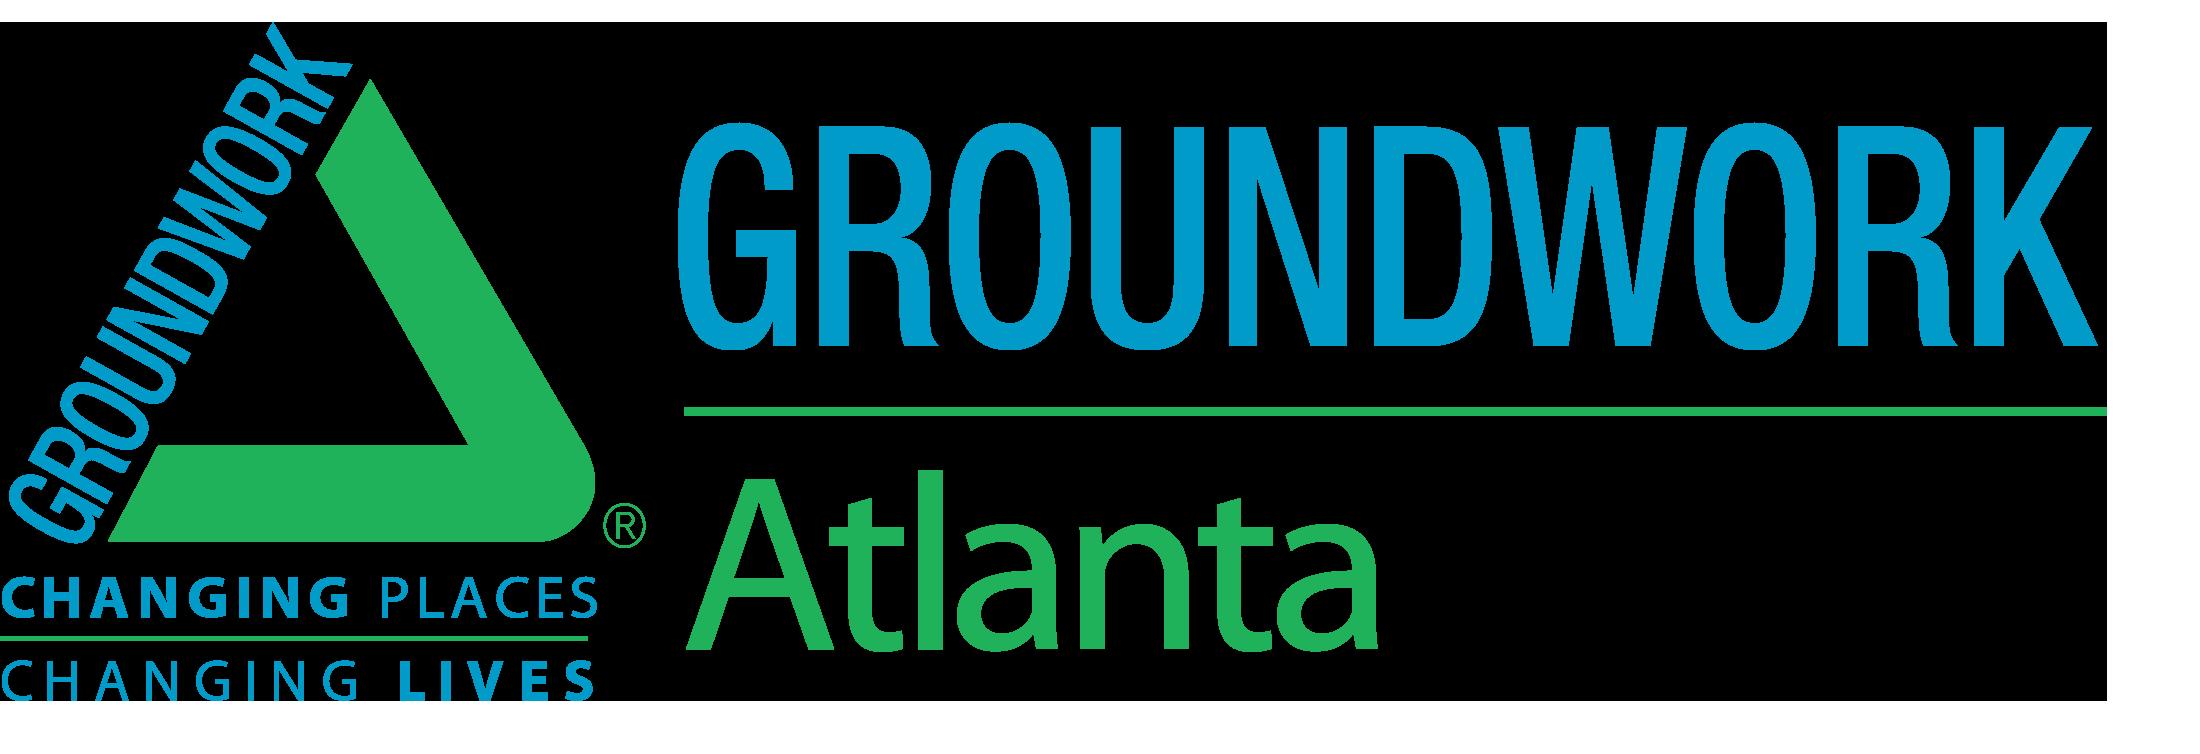 Atlanta_logo.png